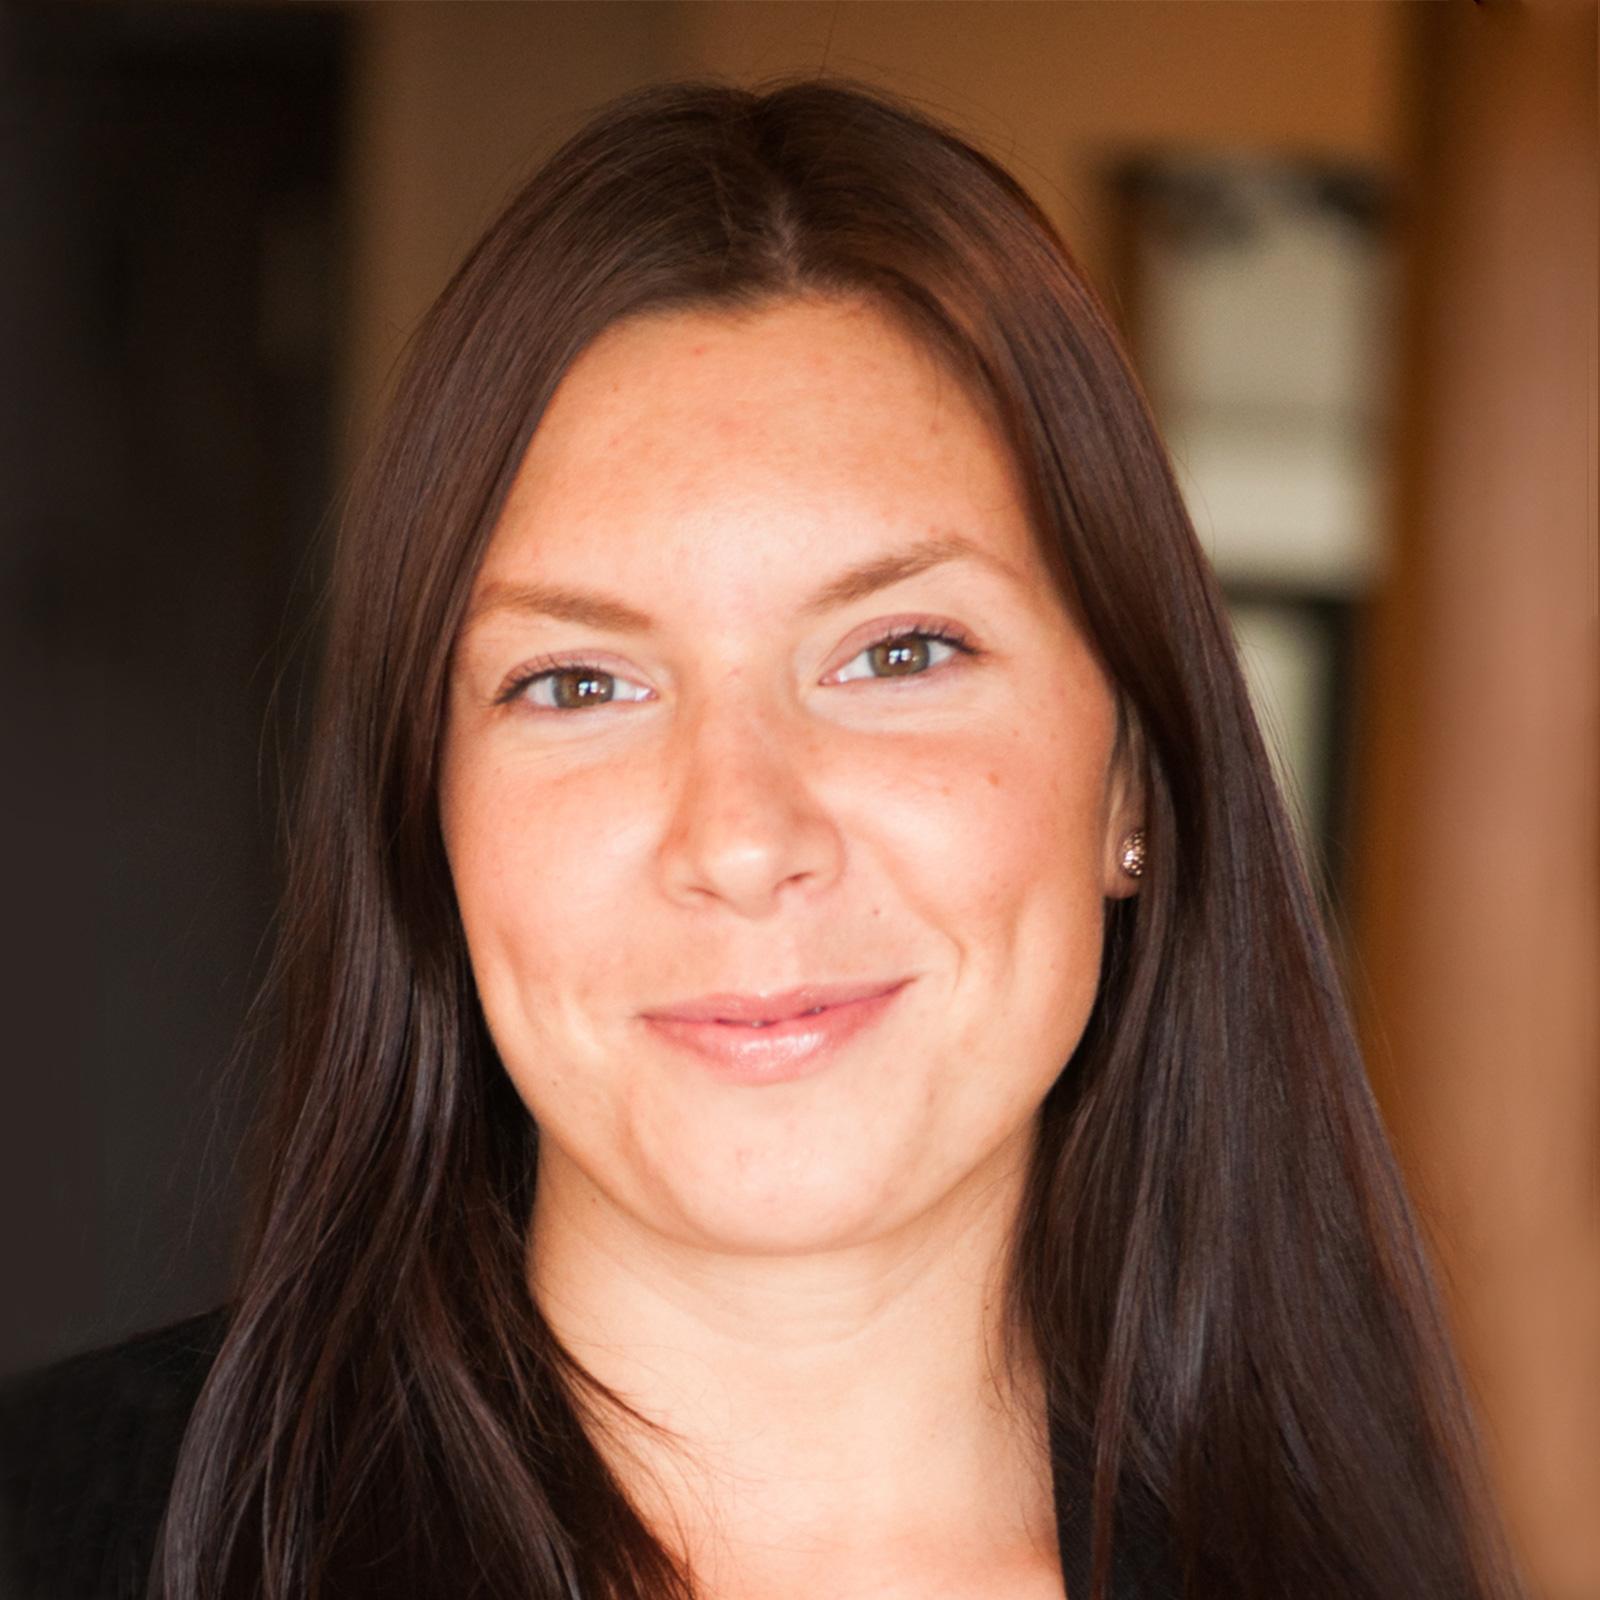 Samantha Sierocuk